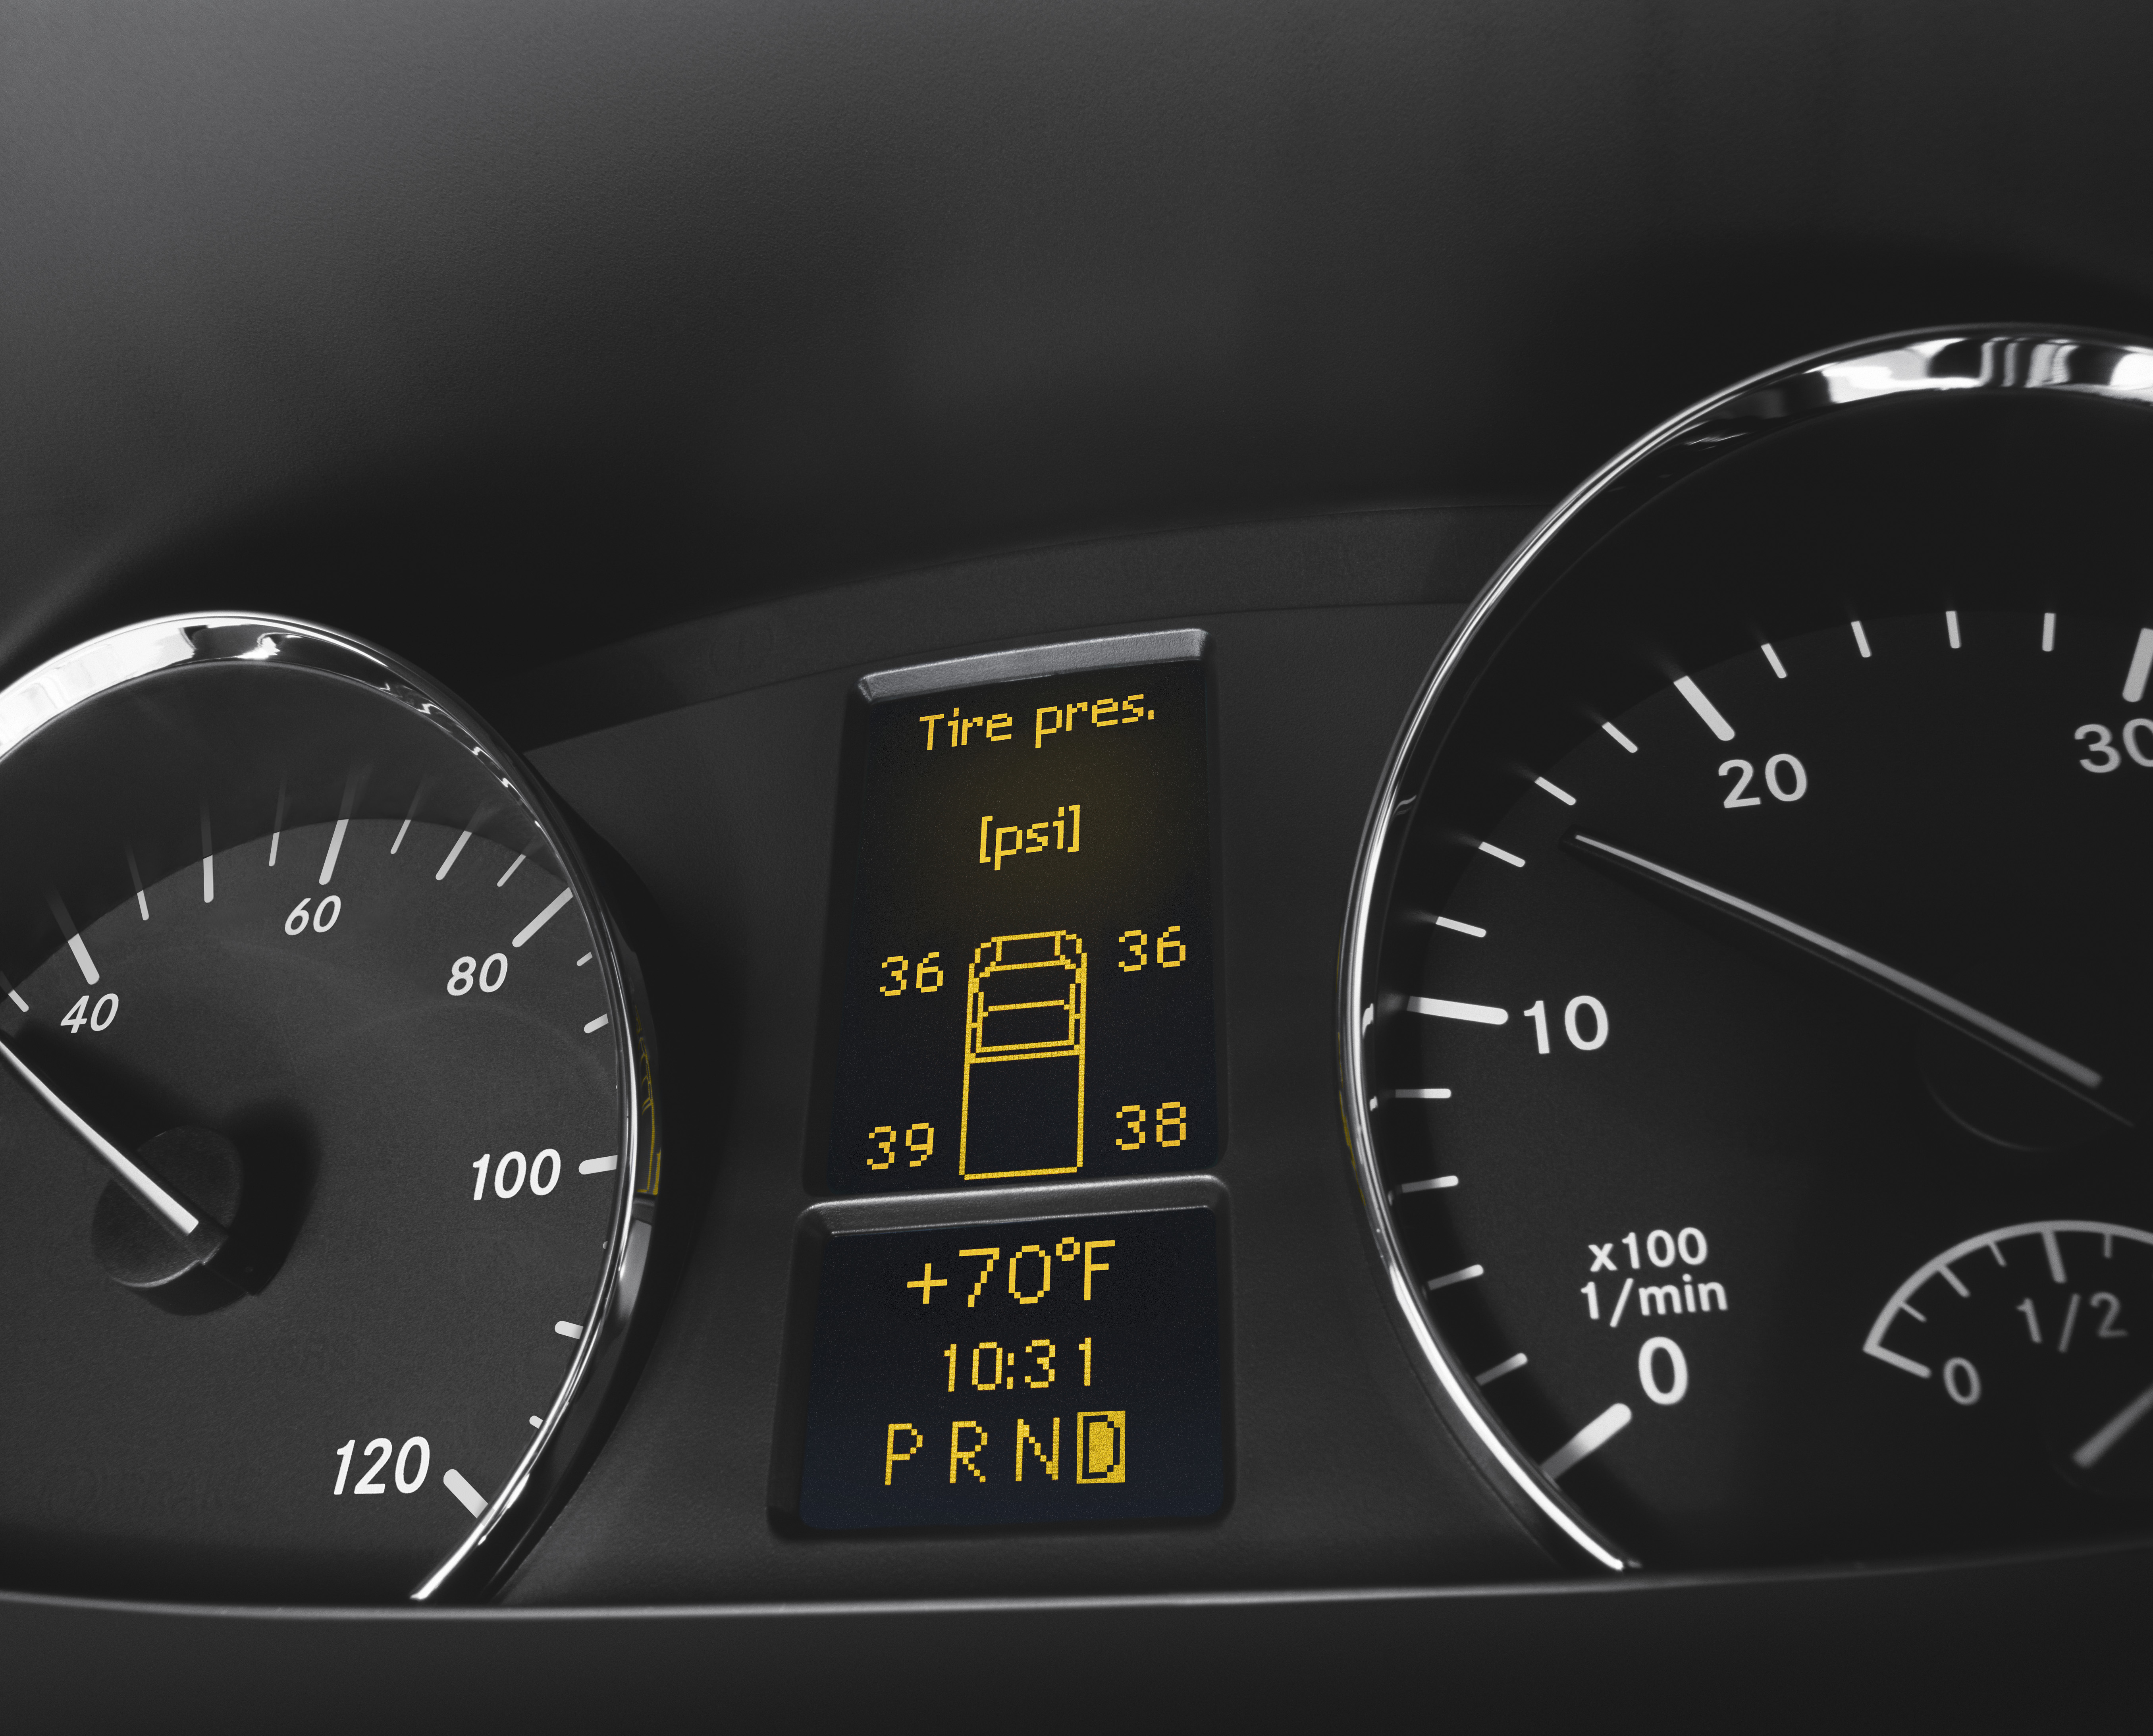 Tyre pressure for mercedes sprinter van for Mercedes benz c300 tire pressure